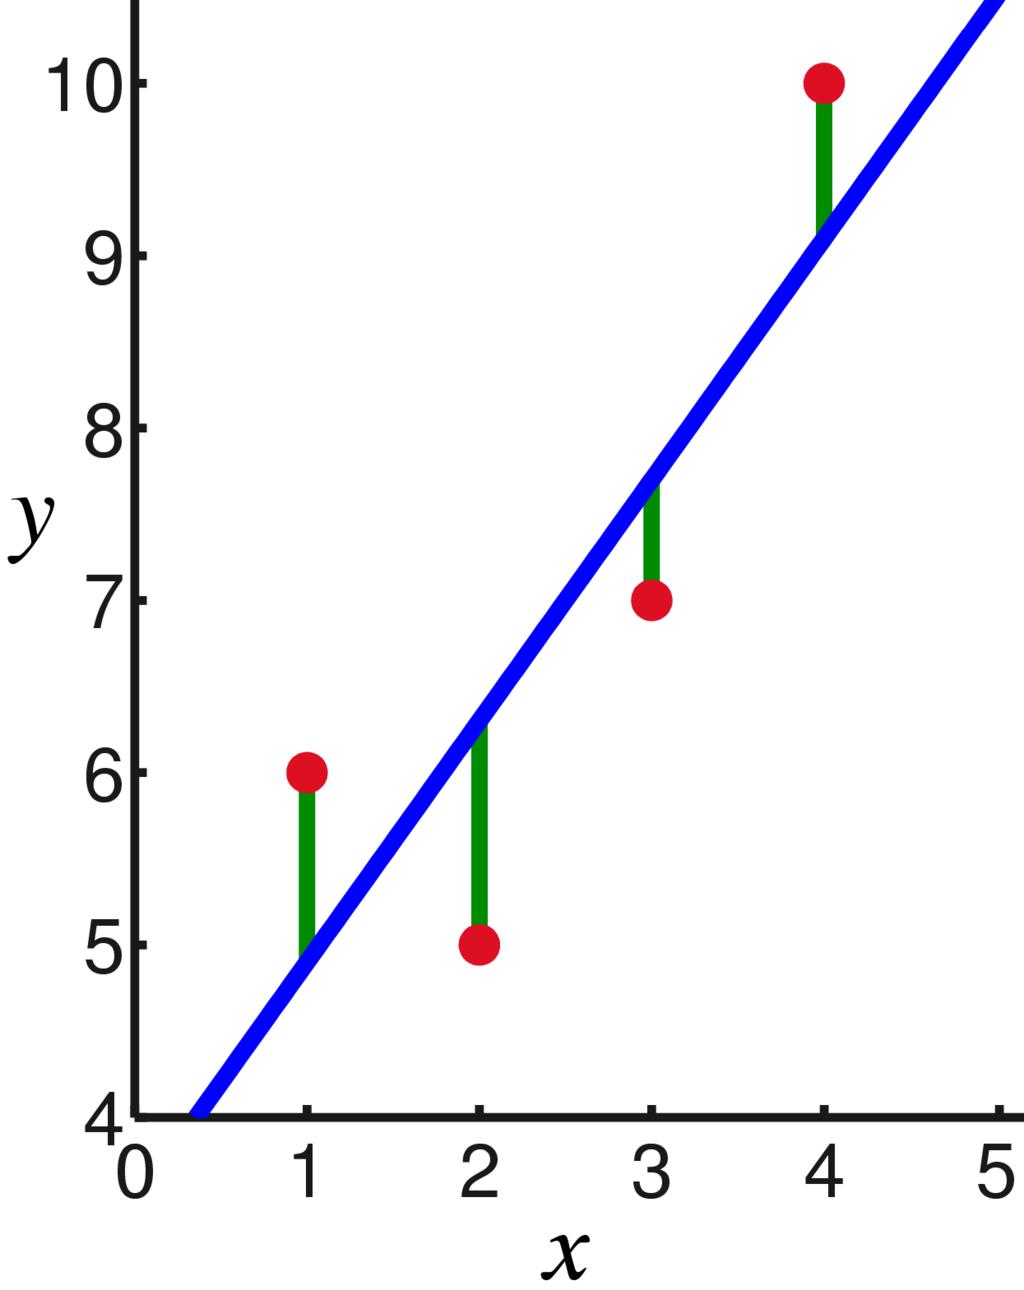 WebRTC研究:Trendline滤波器-TrendlineEstimator - 第4张  | 剑痴乎